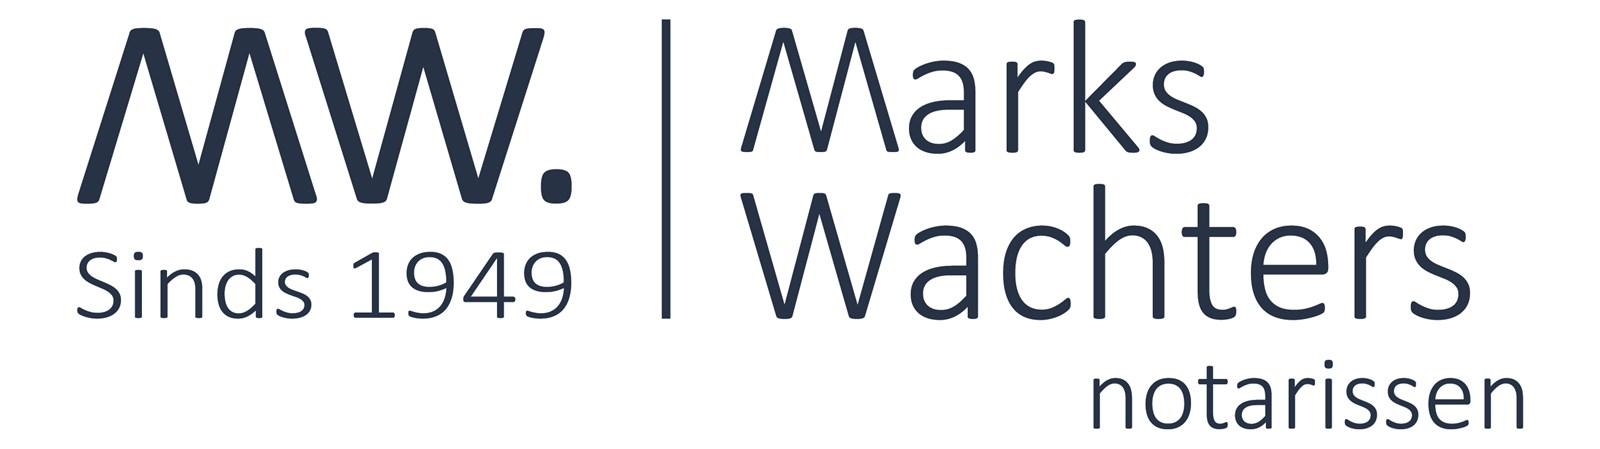 Marks Wachters notarissen Nuenen